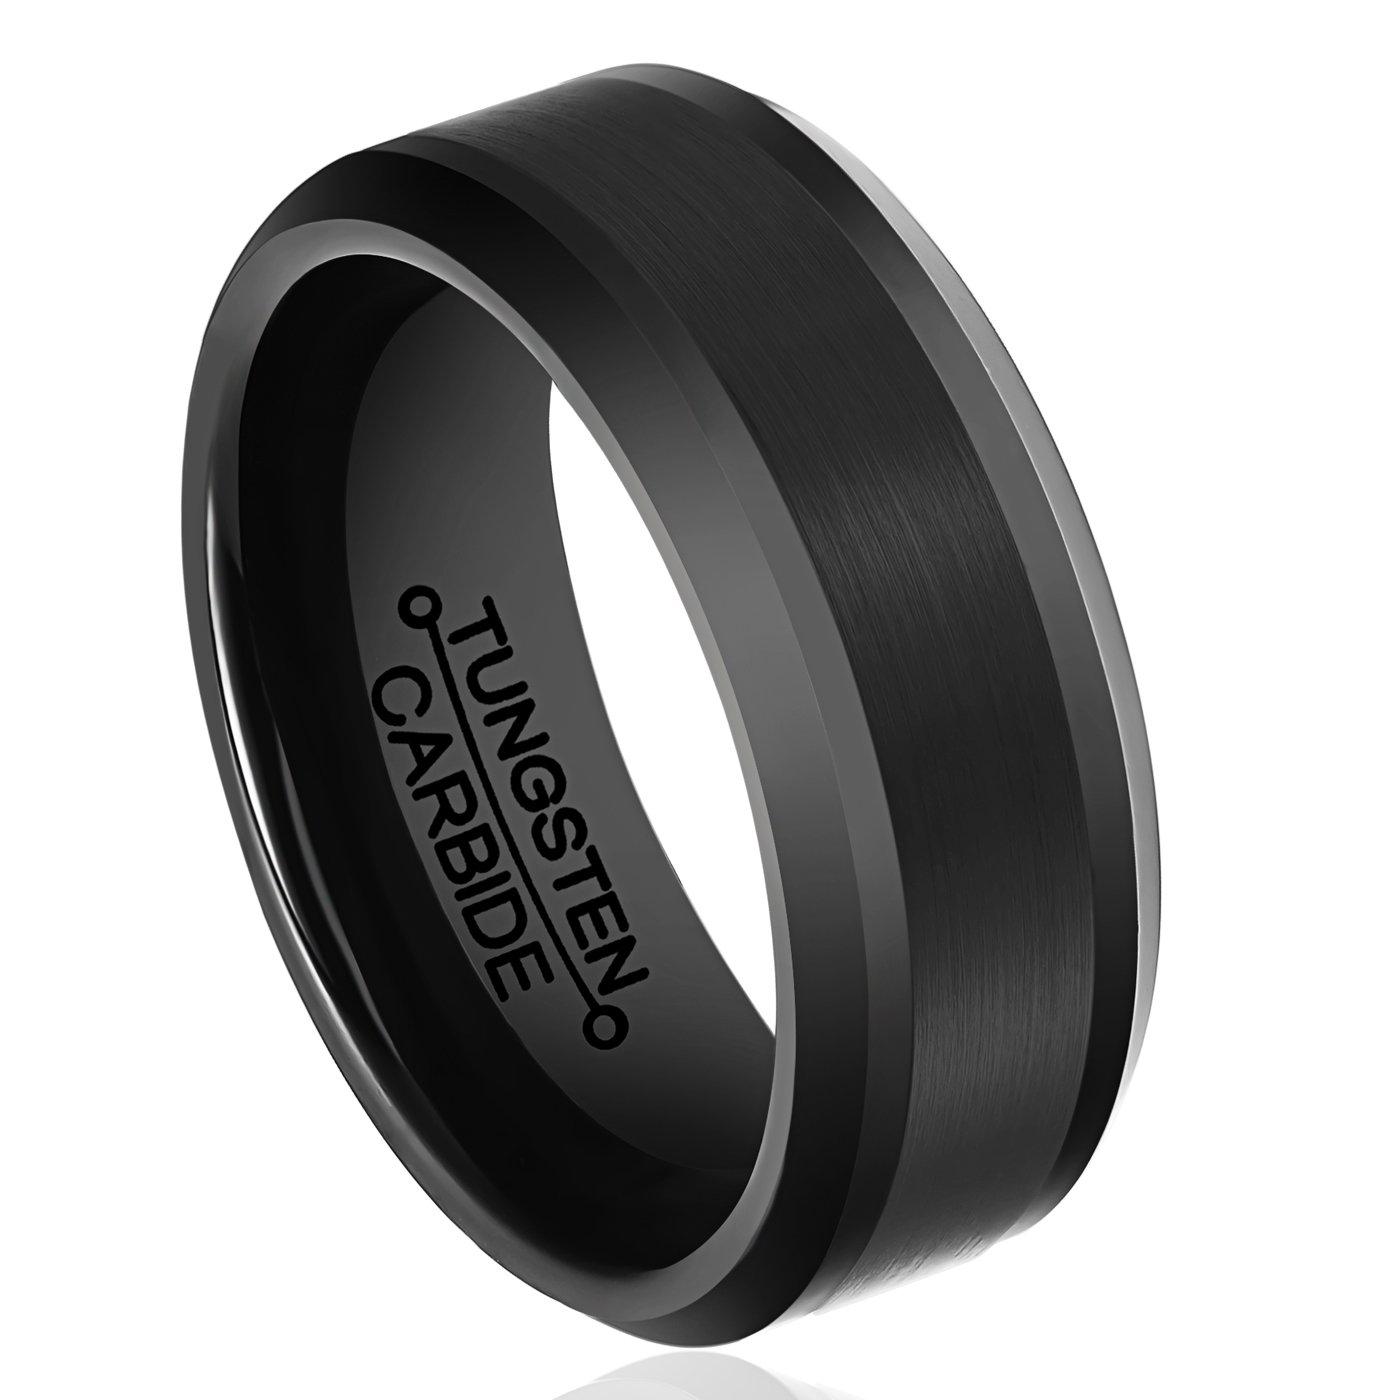 HSG Tungsten Rings for Men 8mm Black Plating Brushed Center Beveled Edge Wedding Band